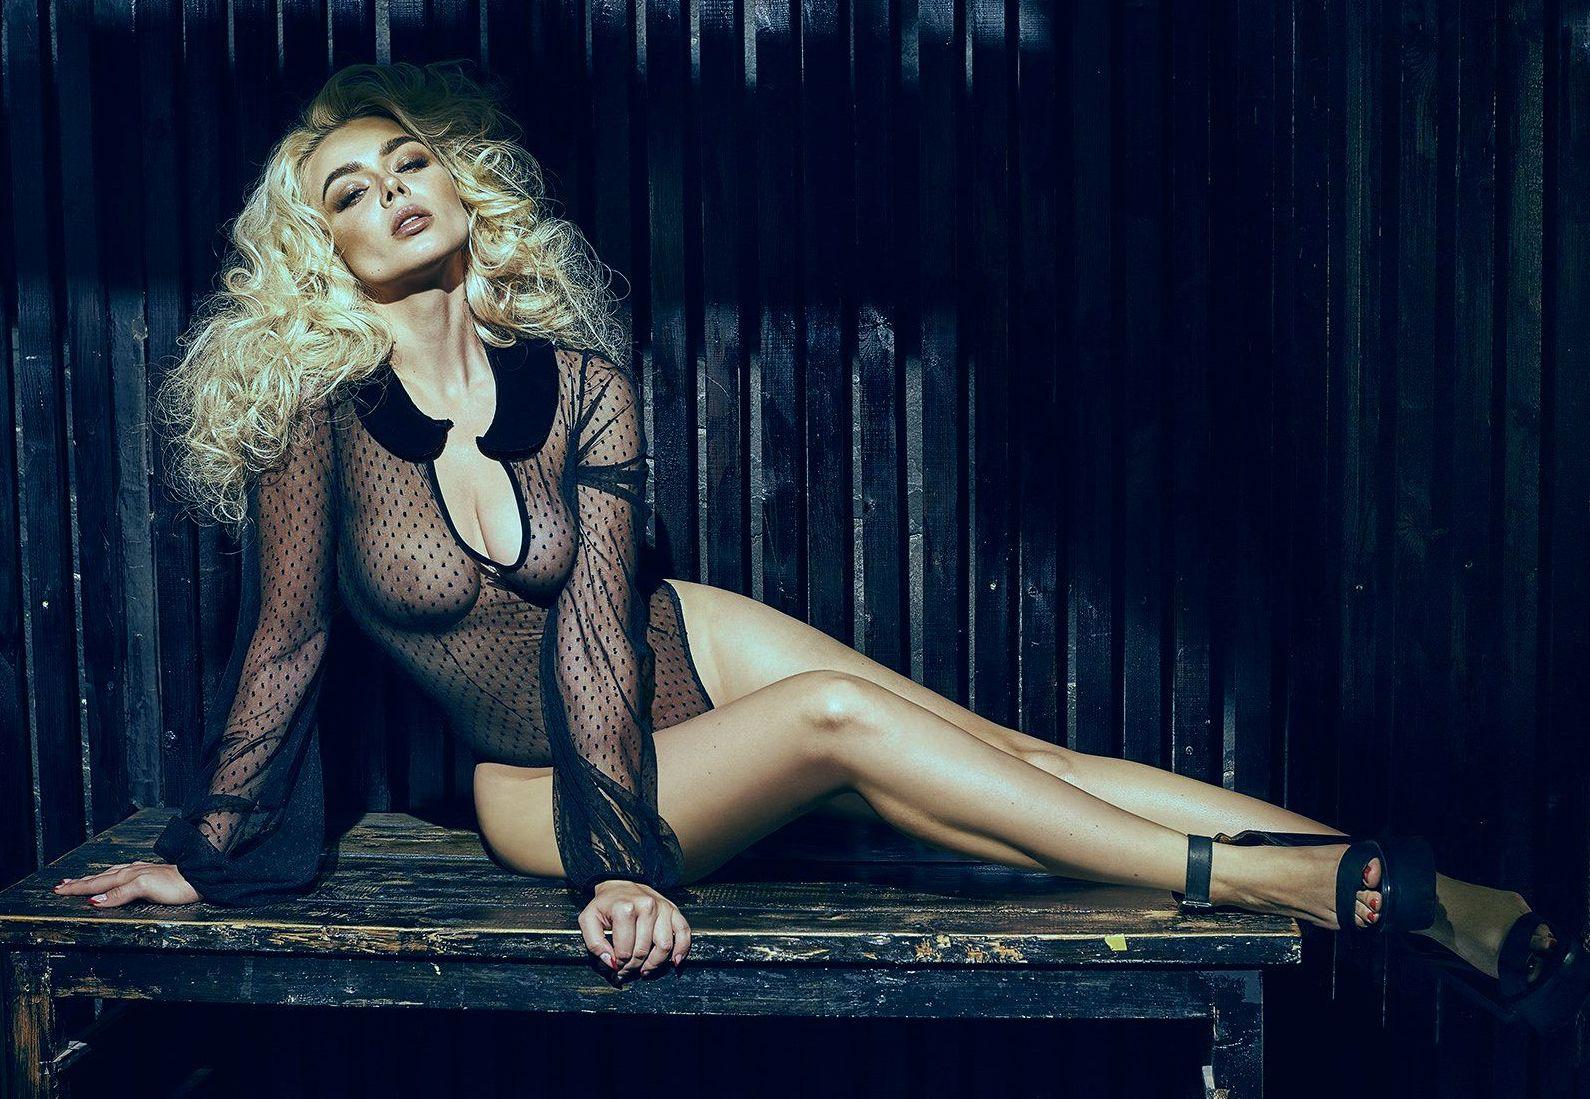 porno-video-s-uchastiem-ukrainskih-zvezd-novinki-pornofilmov-russkoe-porno